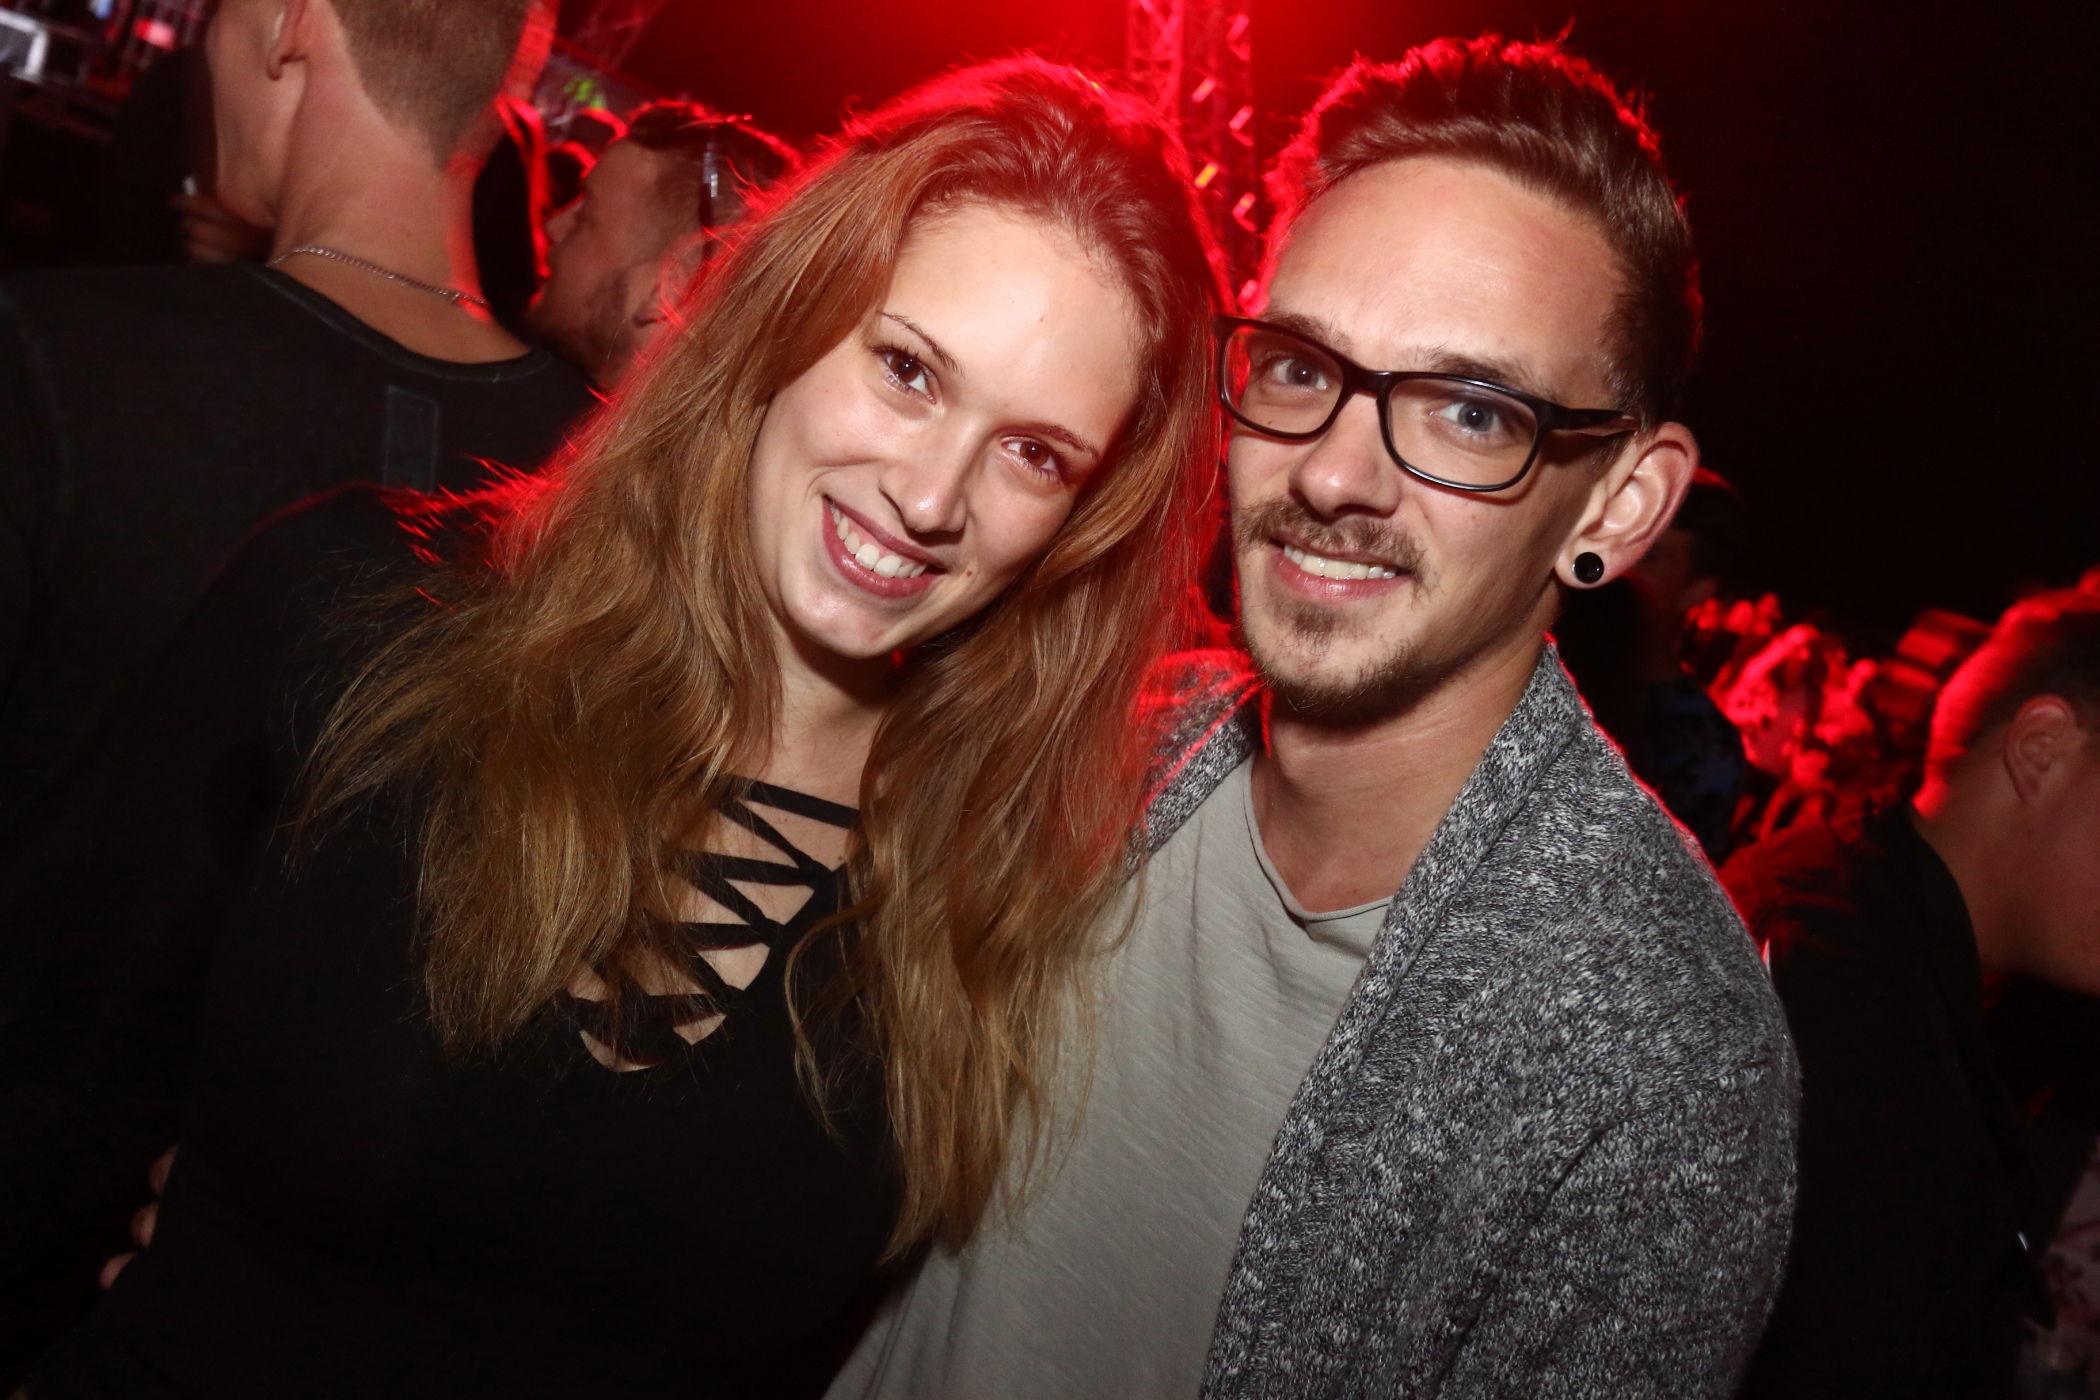 Thal singles frauen Ehefrau will sexdate